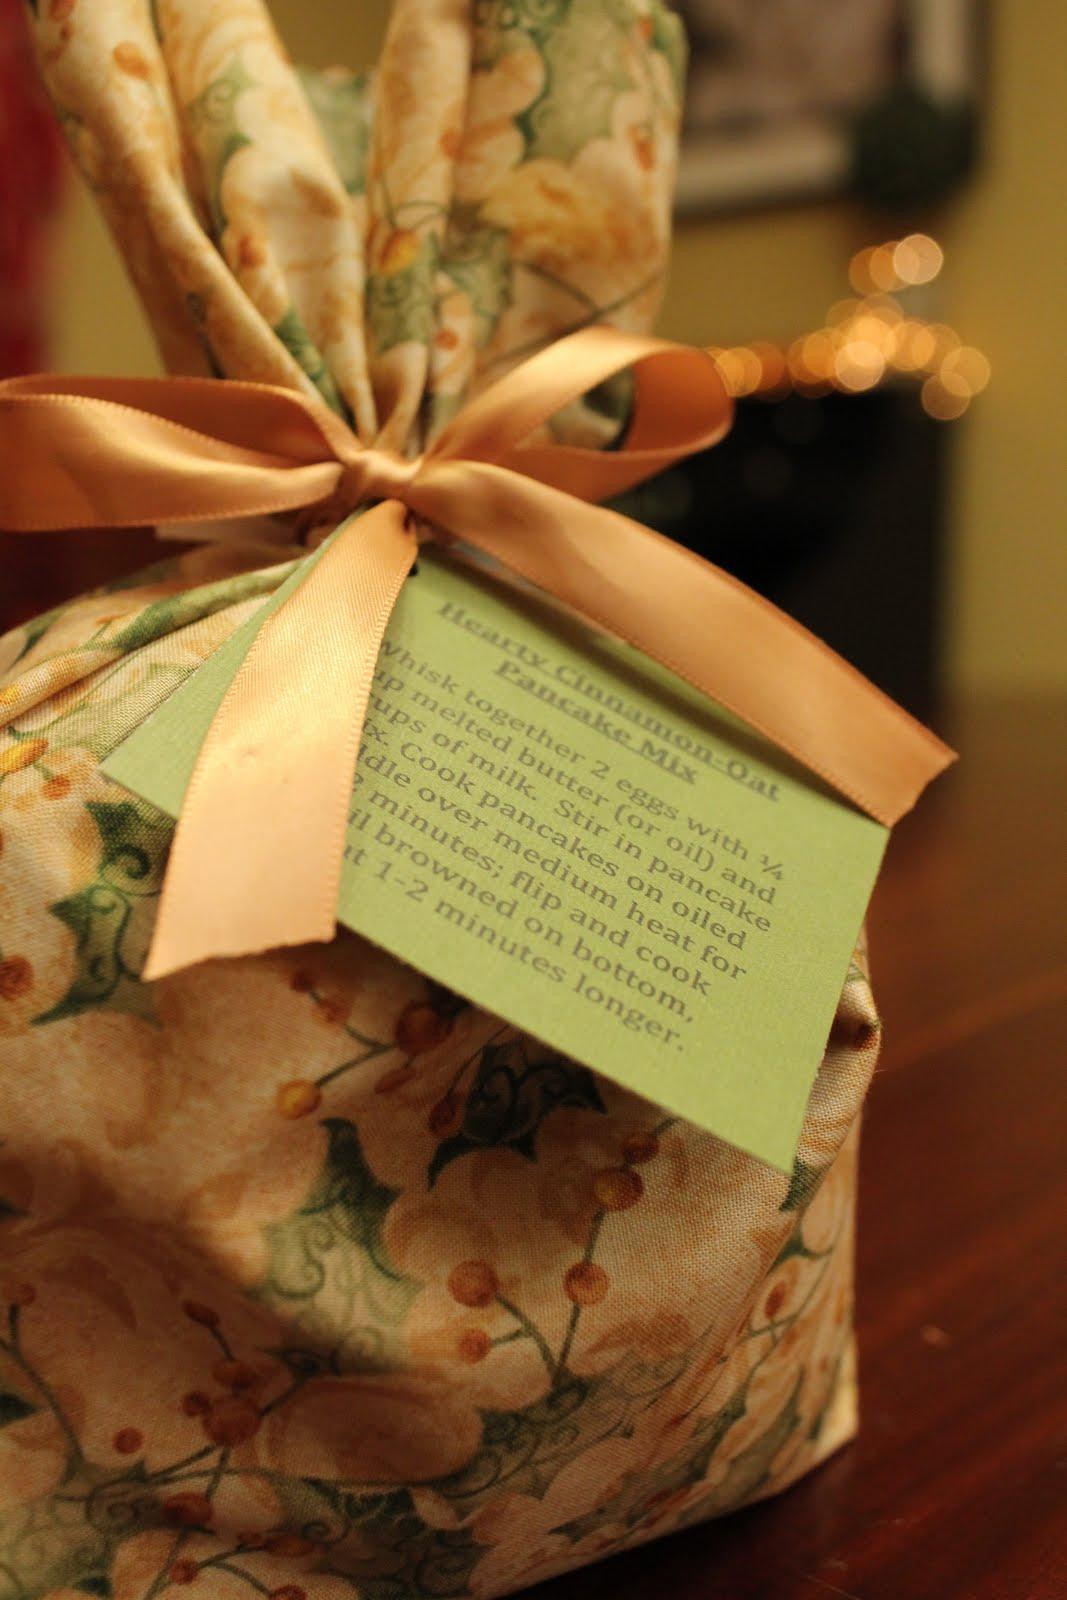 Pancake Mix in a Fabric Gift Bag